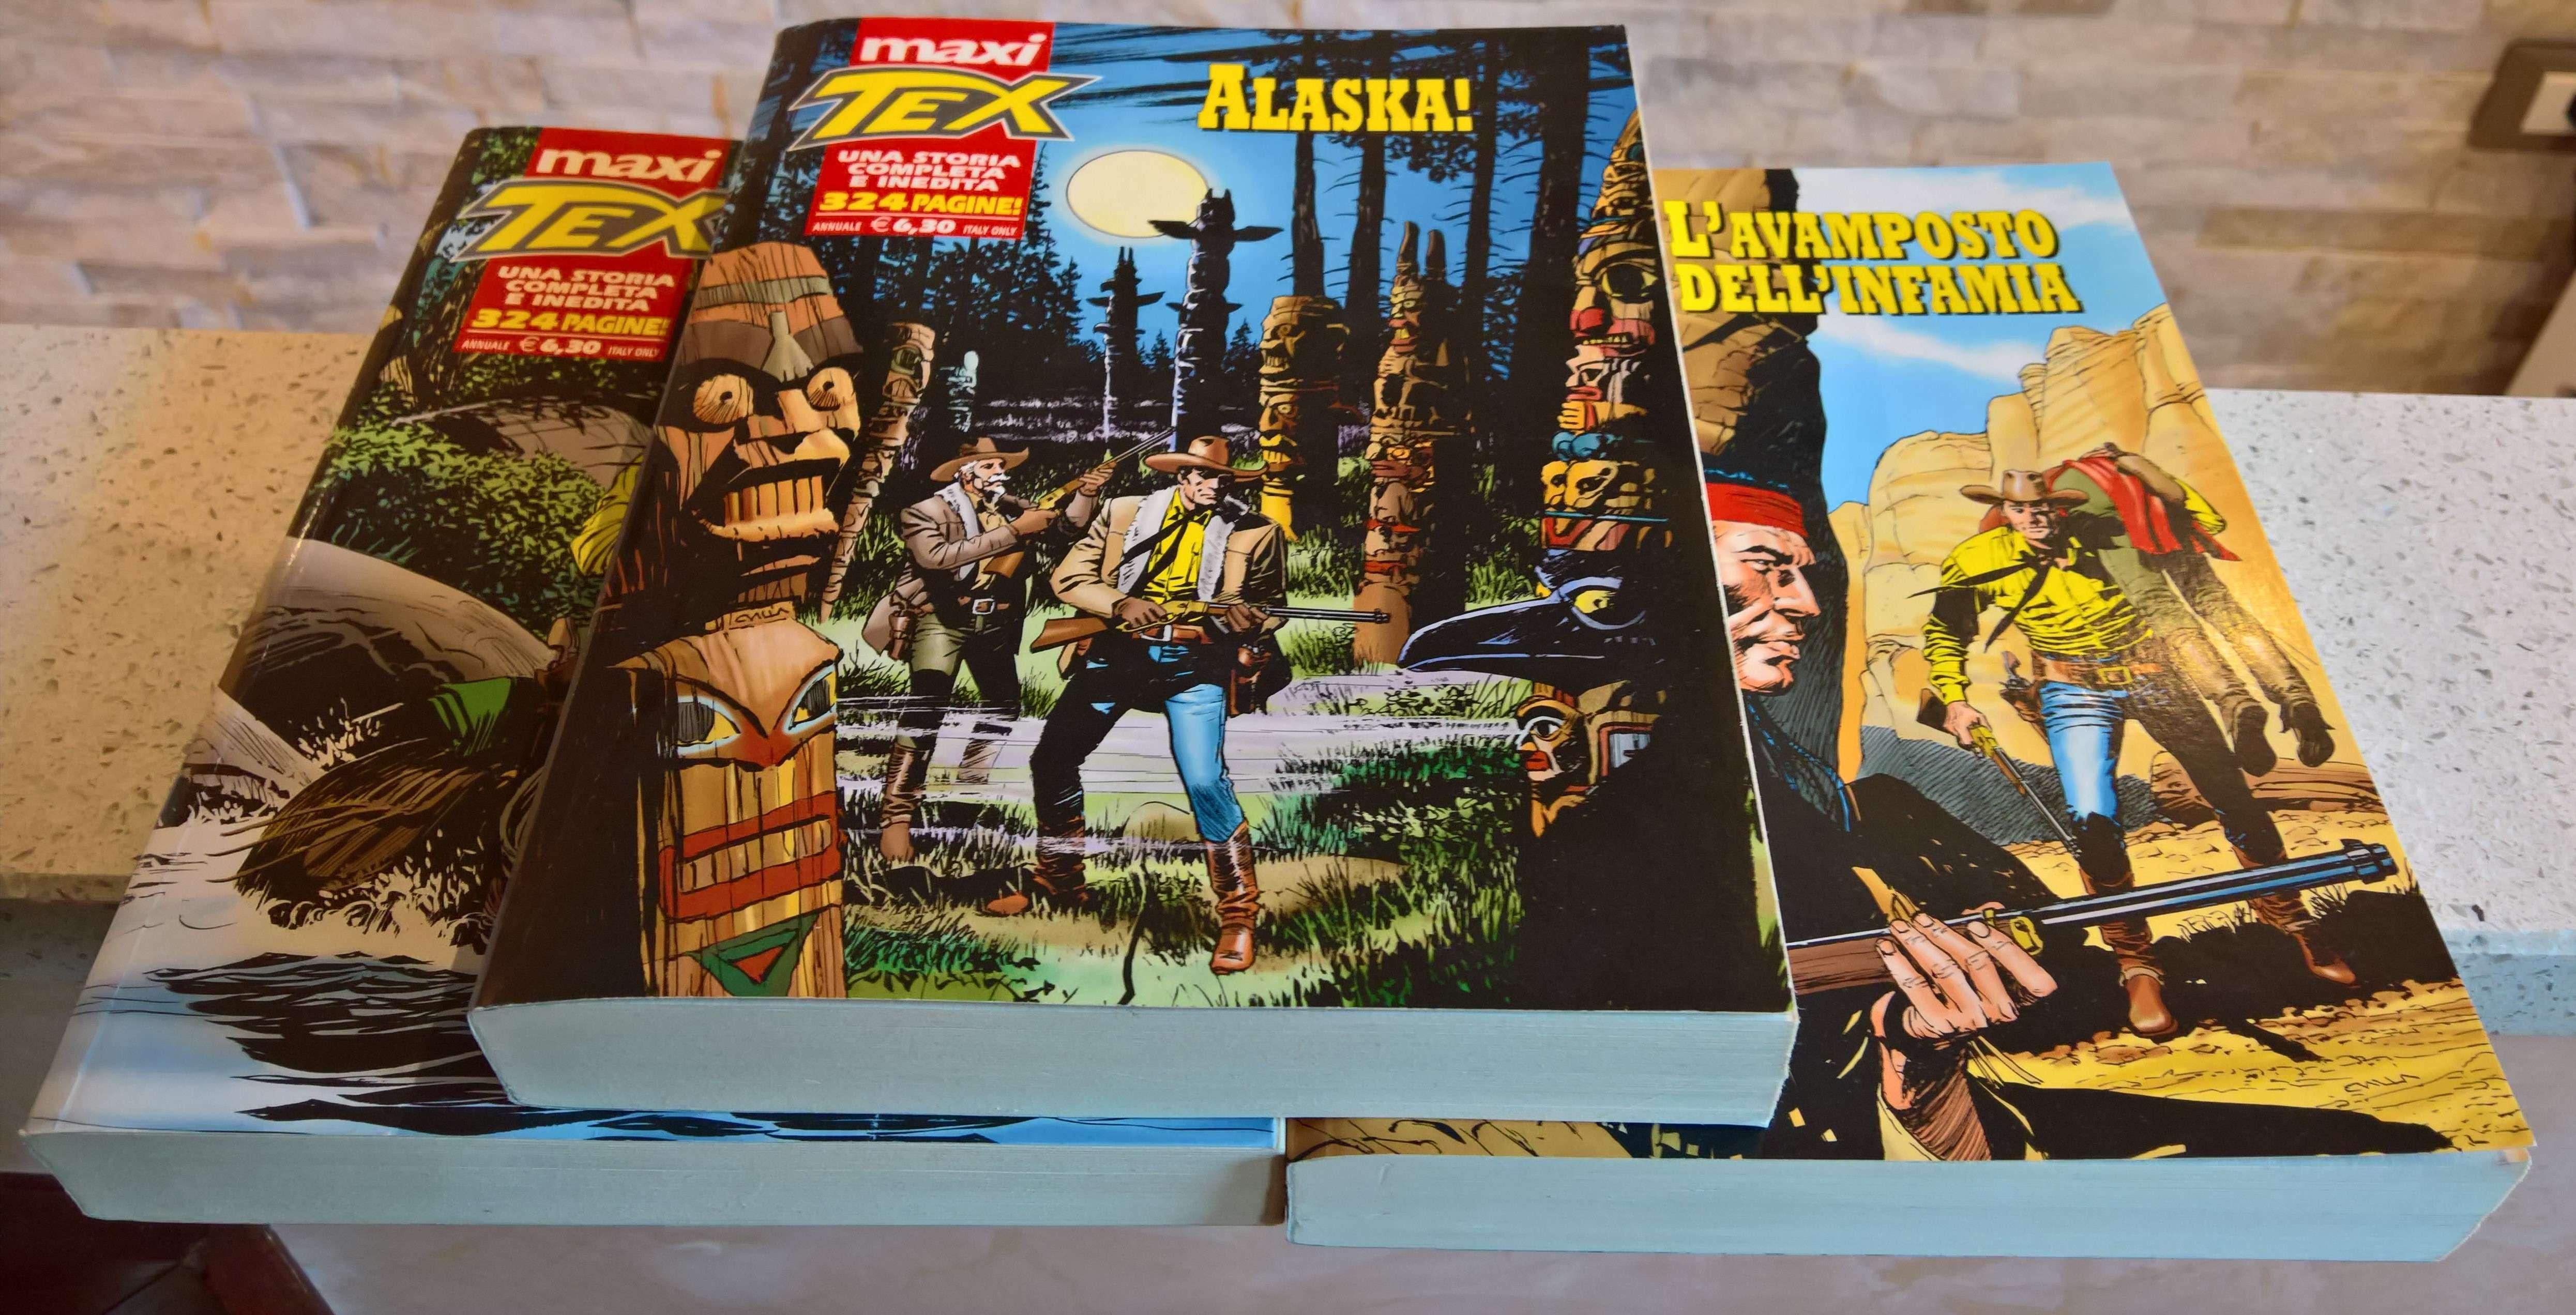 L'avamposto dell'infamia - Alaska ! - La legge Staker